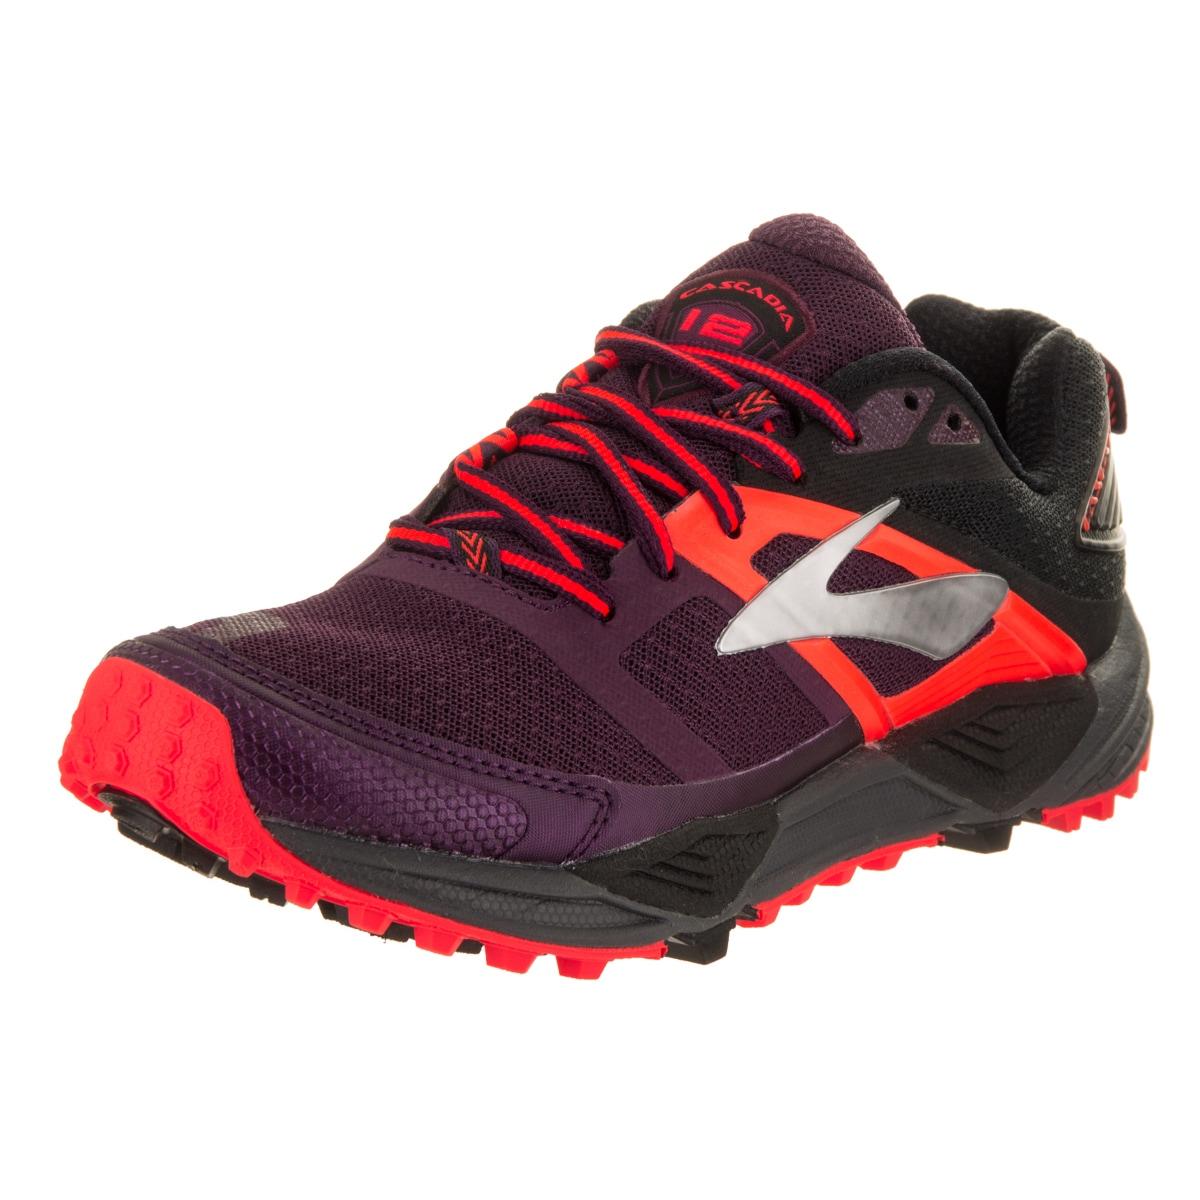 Cascadia 12 Running Shoe - Overstock